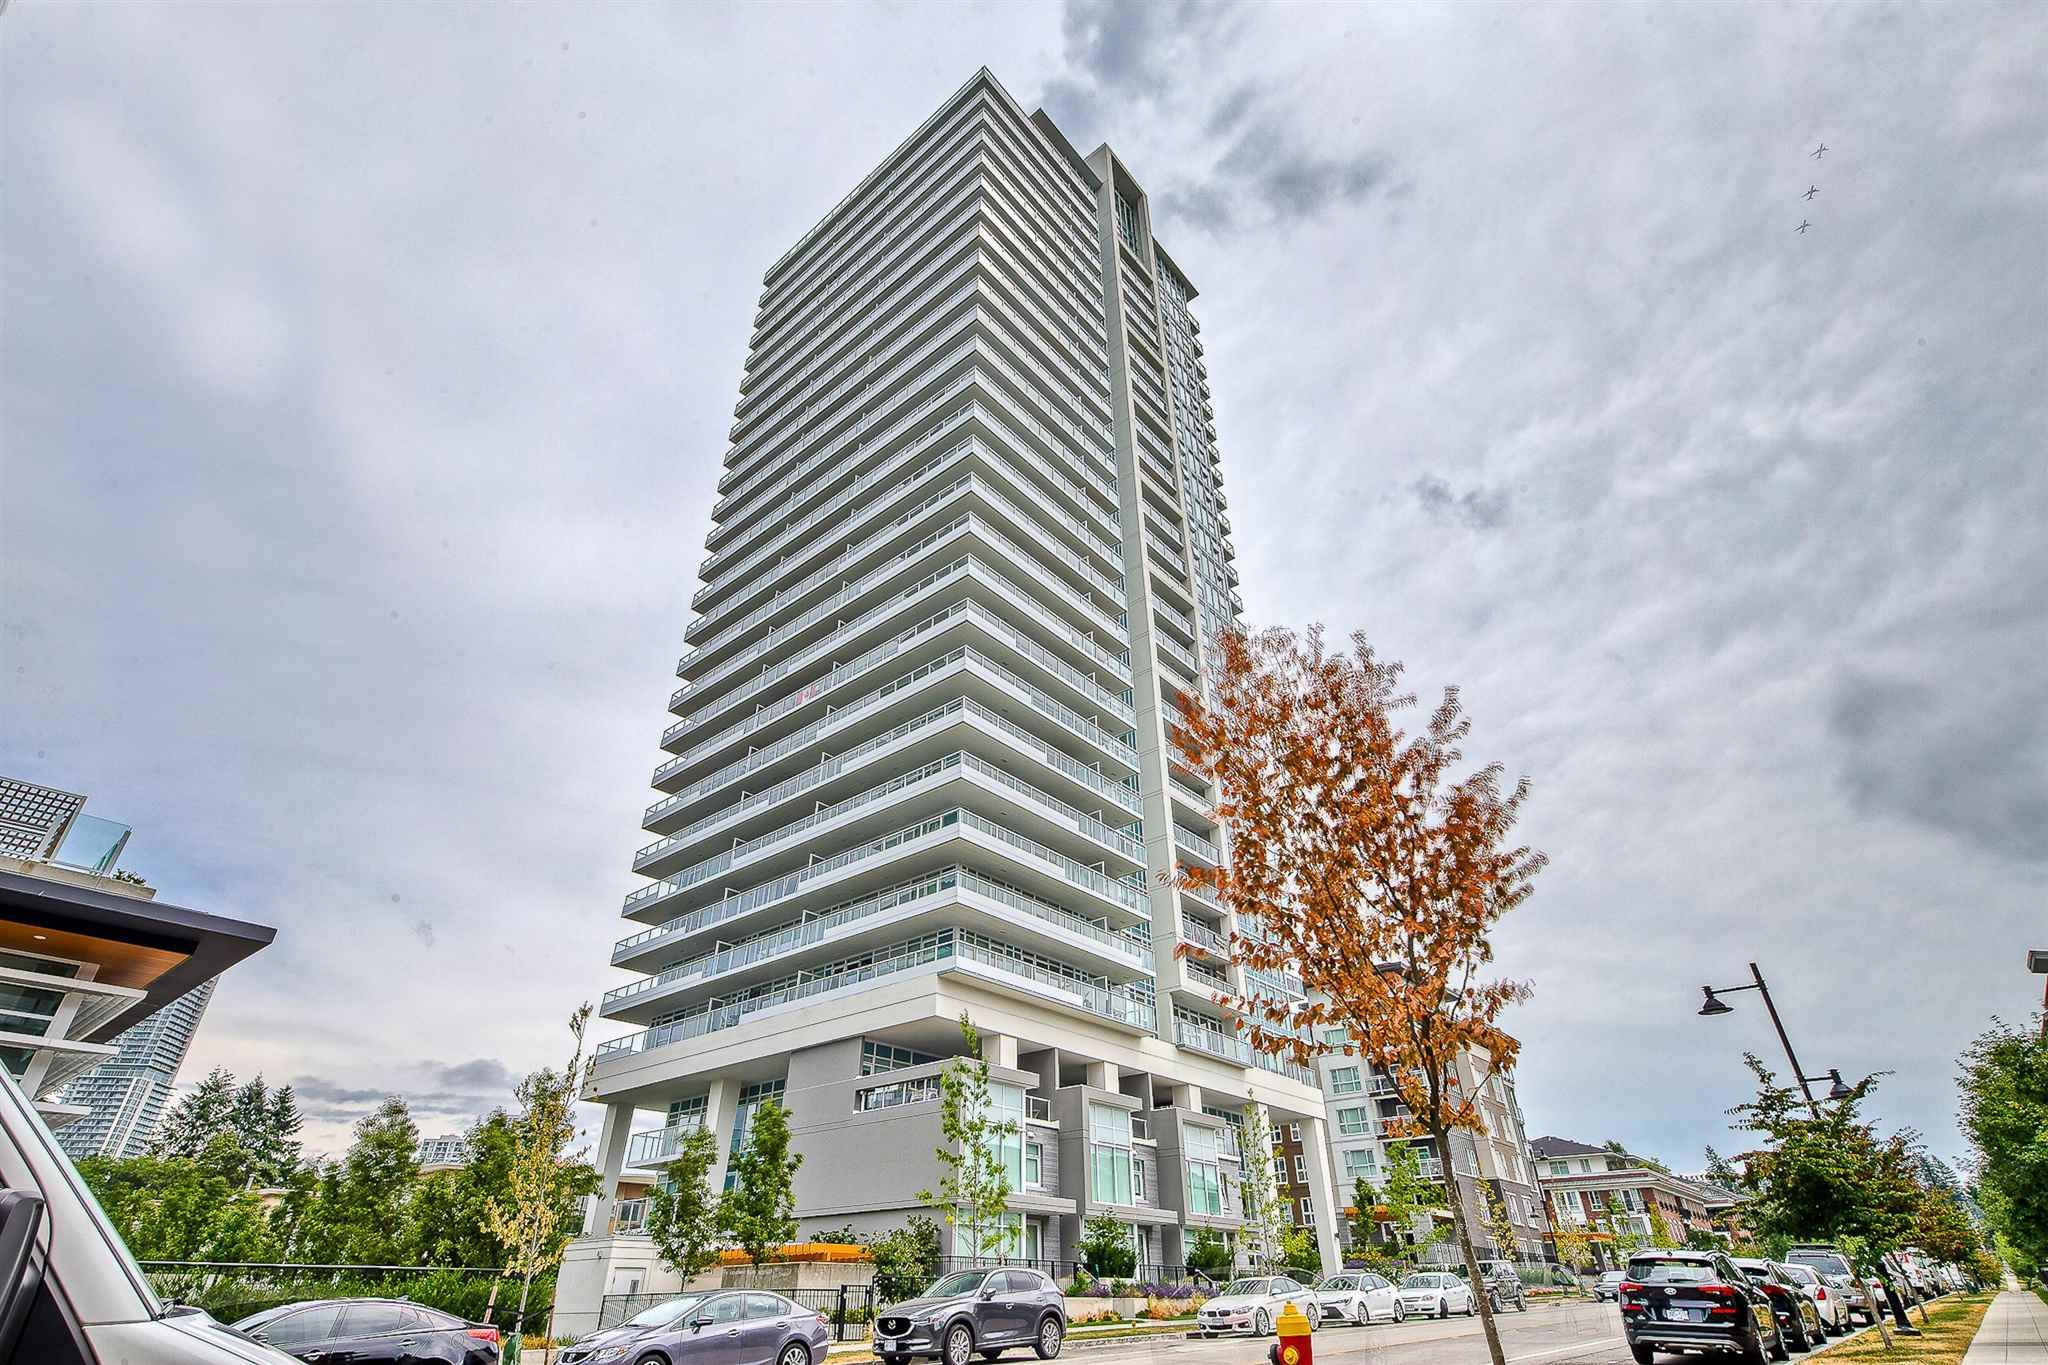 Main Photo: 708 525 FOSTER AVENUE in Coquitlam: Coquitlam West Condo for sale : MLS®# R2600021